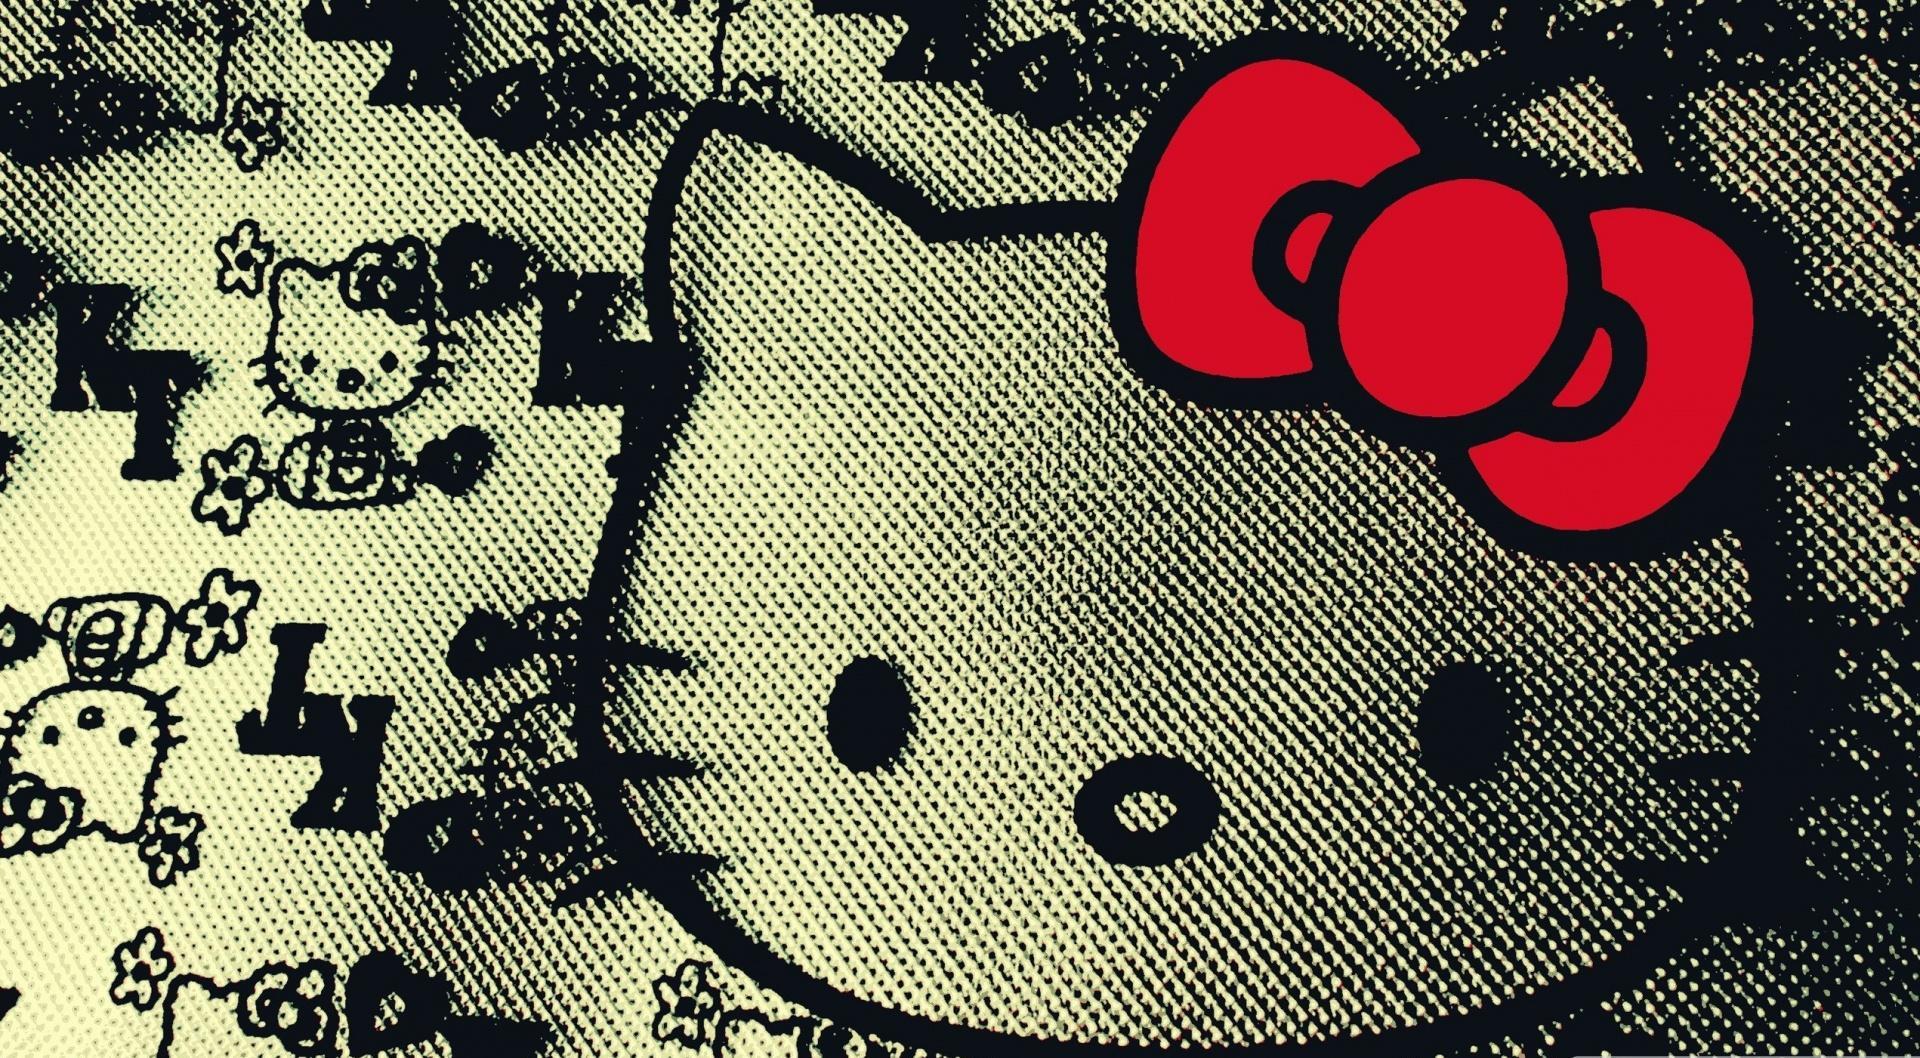 Hello kitty design Wallpaper 19201080 19201058 Wallpaper 1920x1058